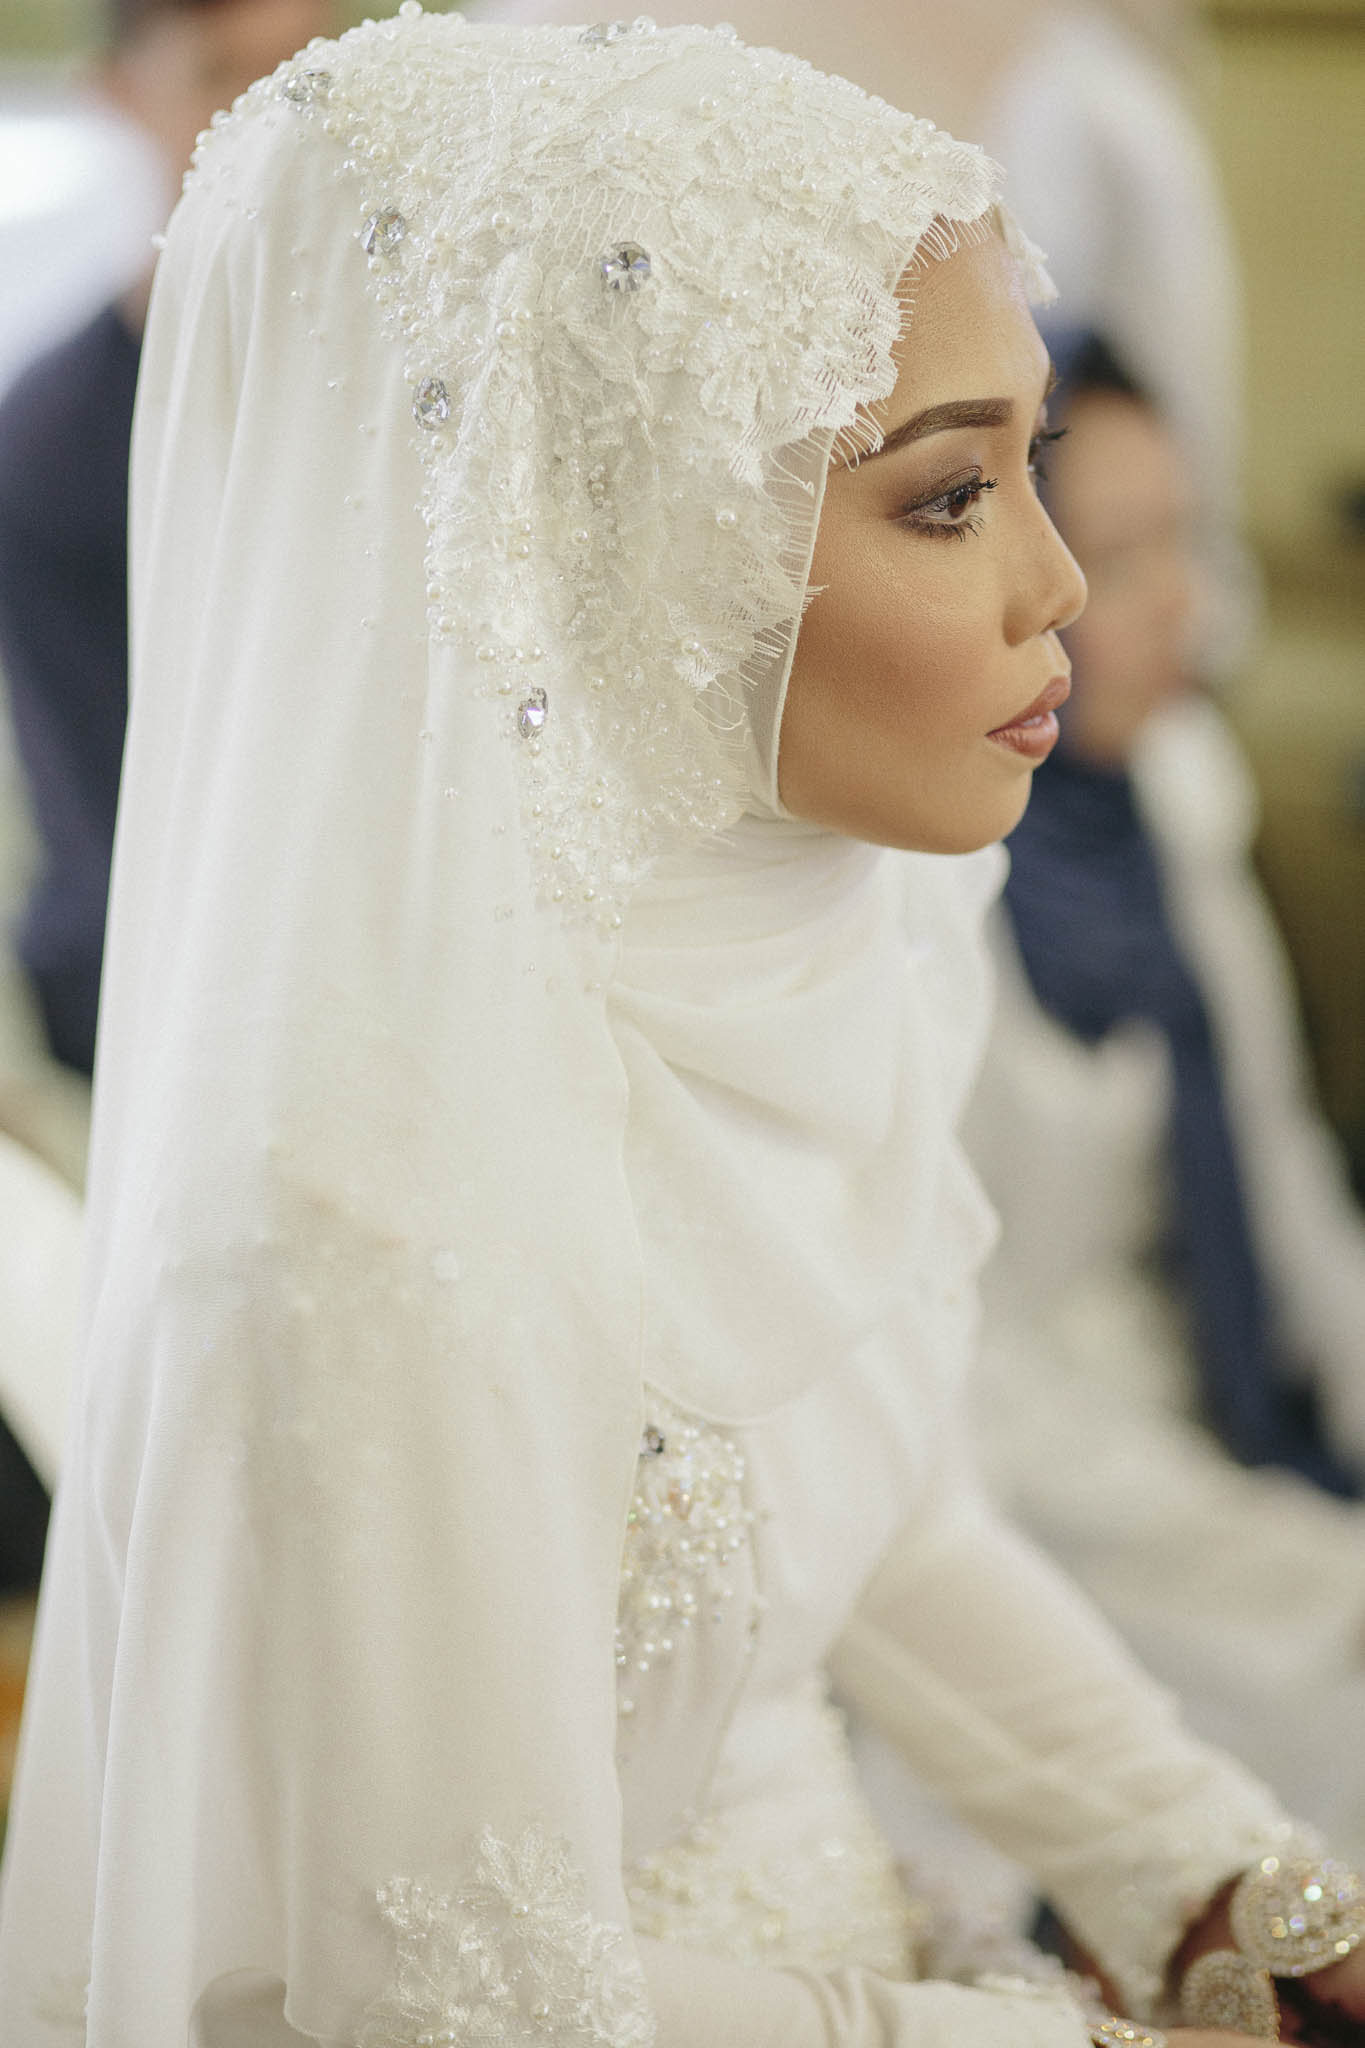 singapore-wedding-photographer-travel-khairul-atikah-11.jpg